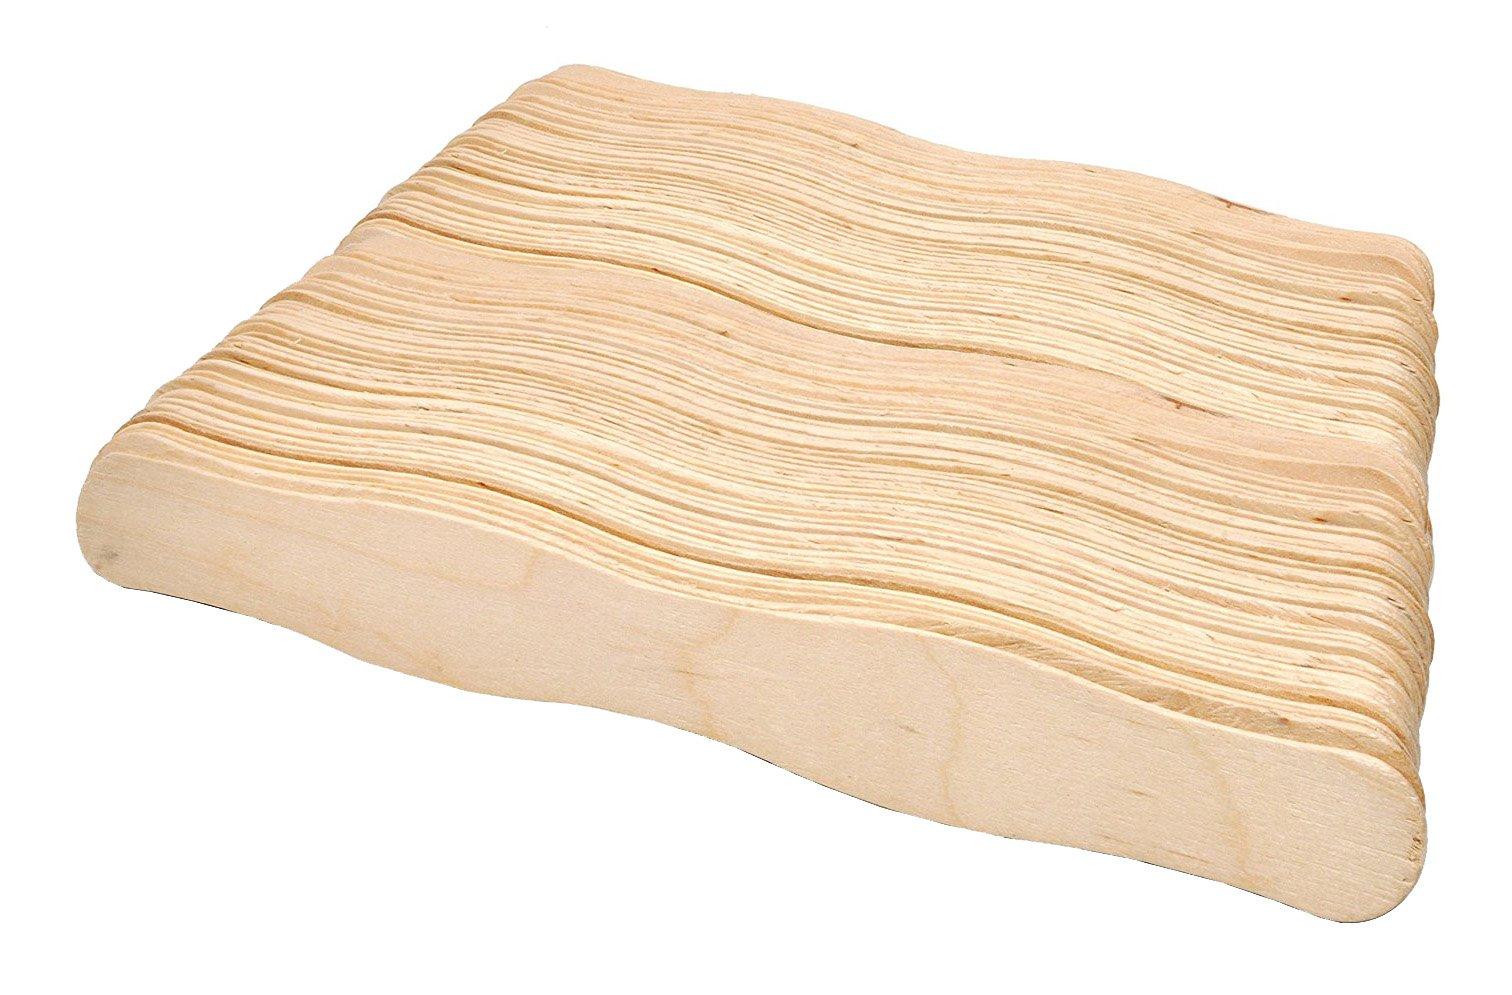 Mandala Crafts 8 Inch Jumbo Wavy Wood Sticks Fan Handles for Projects Auction Bidding Paddles Church Wedding Program (200 Piece Count)